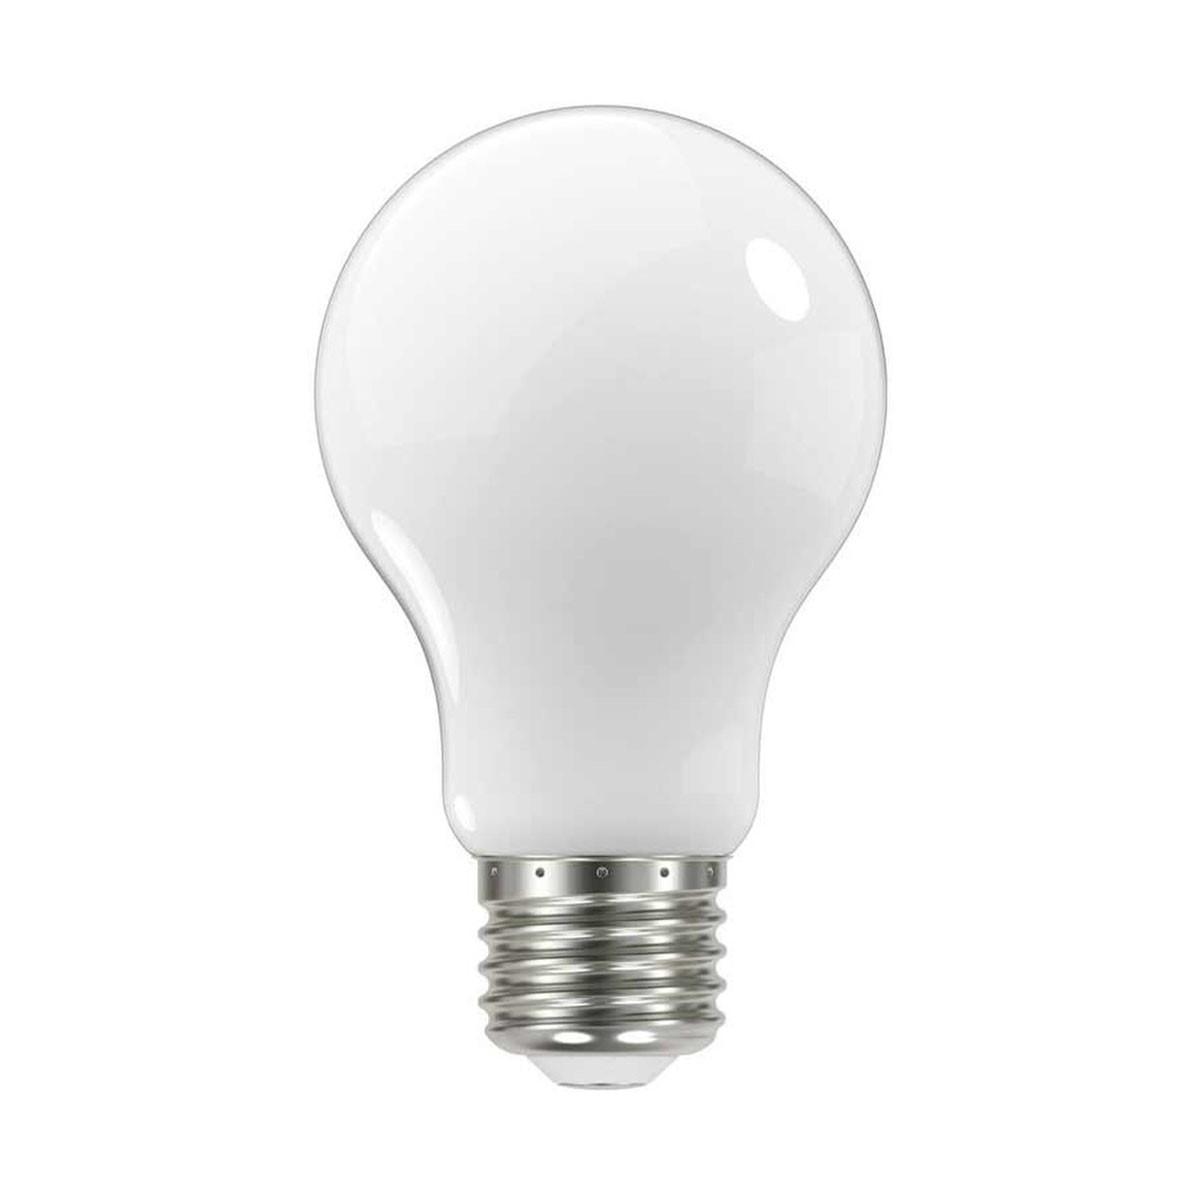 LED Filament Bulb - 11W - A19 - 75W Equal - 1100 Lumens - 3000K - Soft White Finish